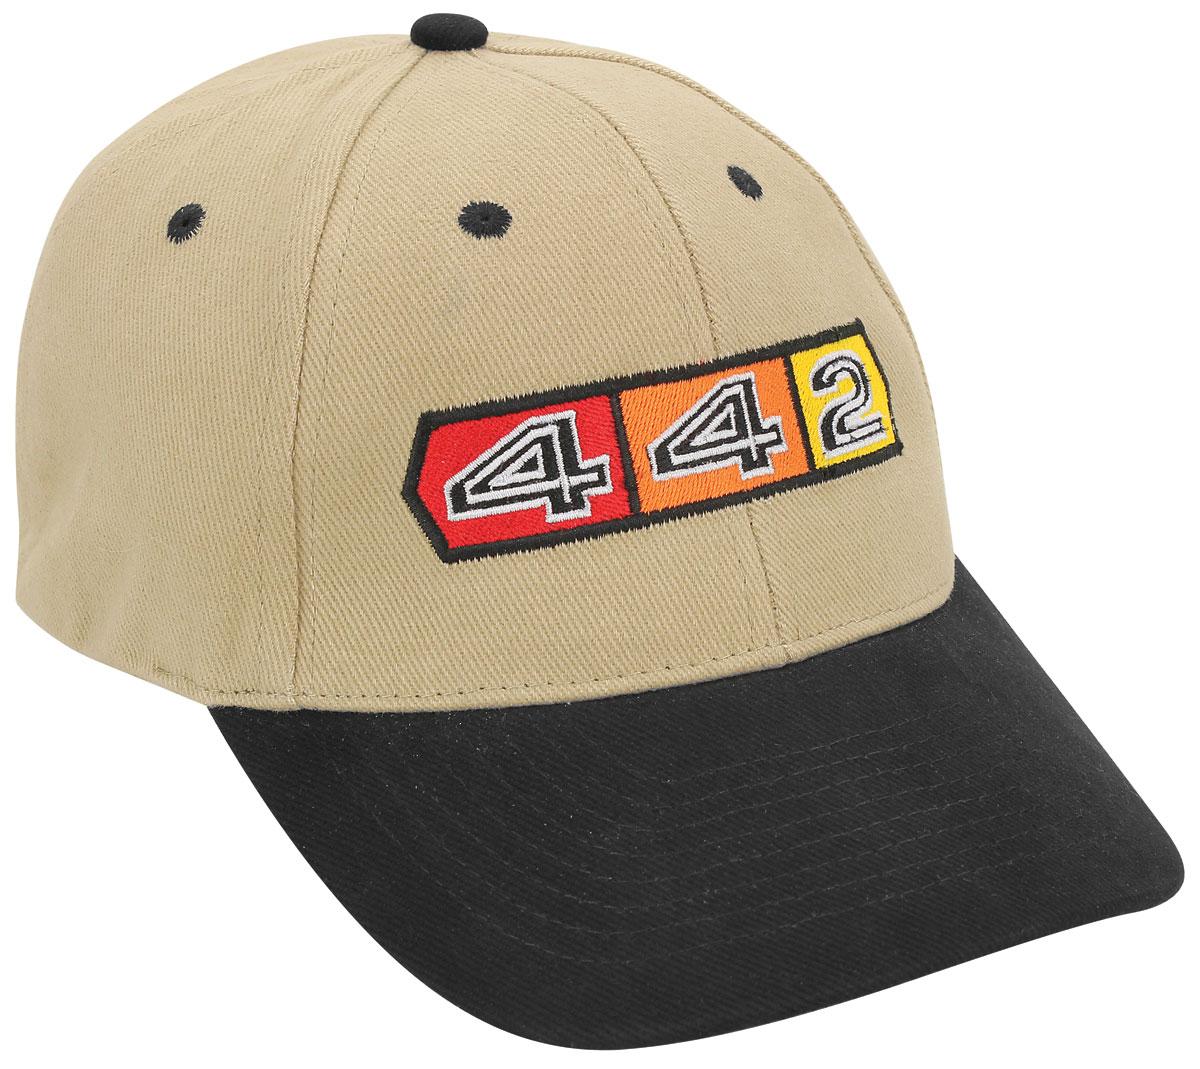 Hat, Oldsmobile 4-4-2 Embroidered